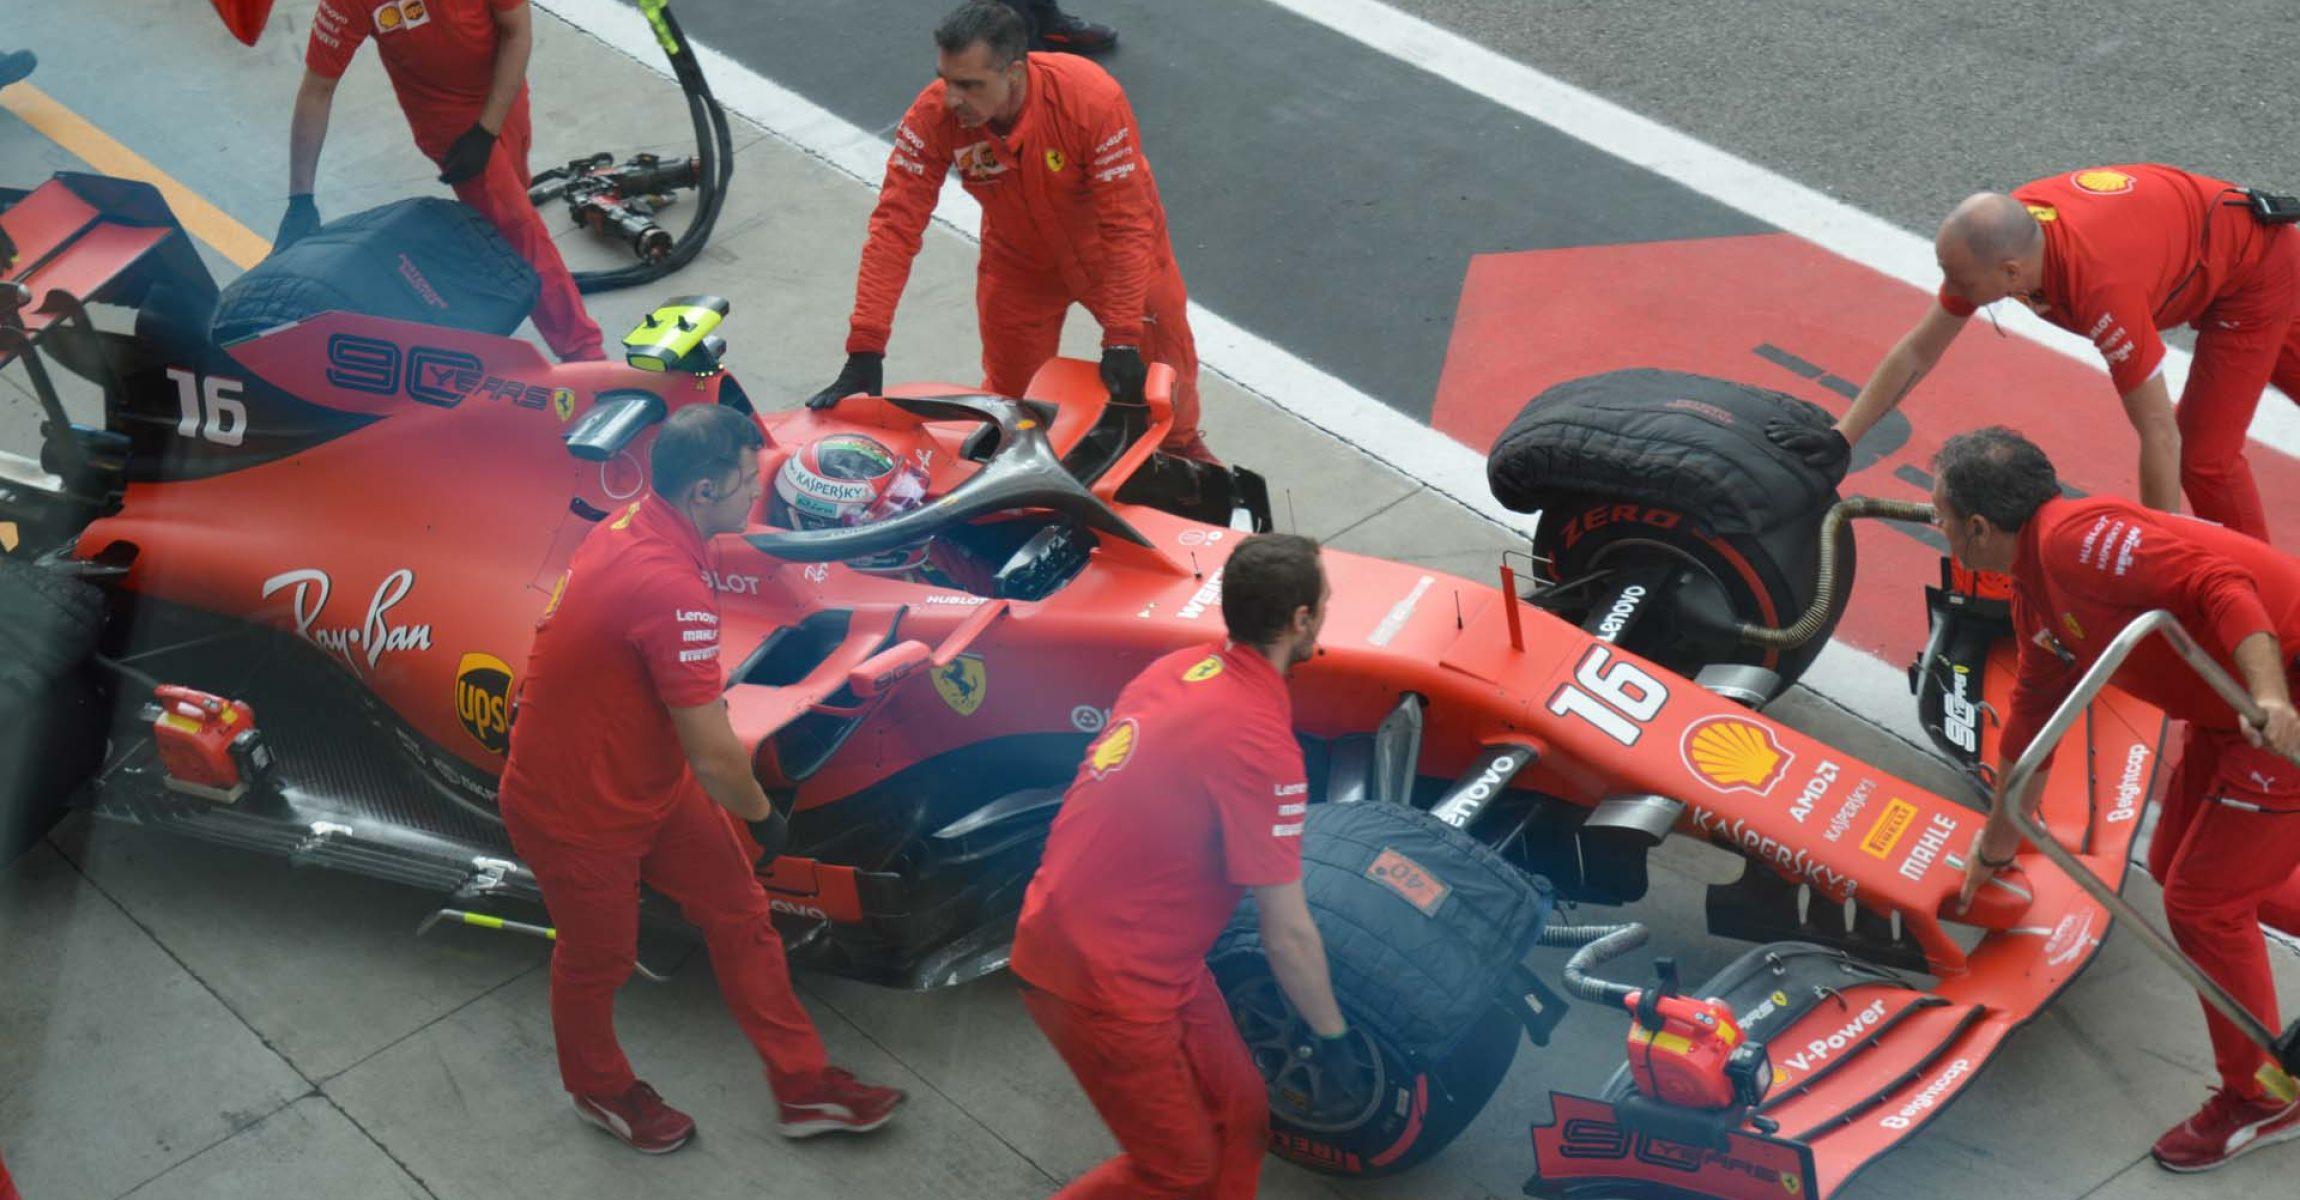 Charles Leclerc, Ferrari, Italian Grand Prix 2019, Monza